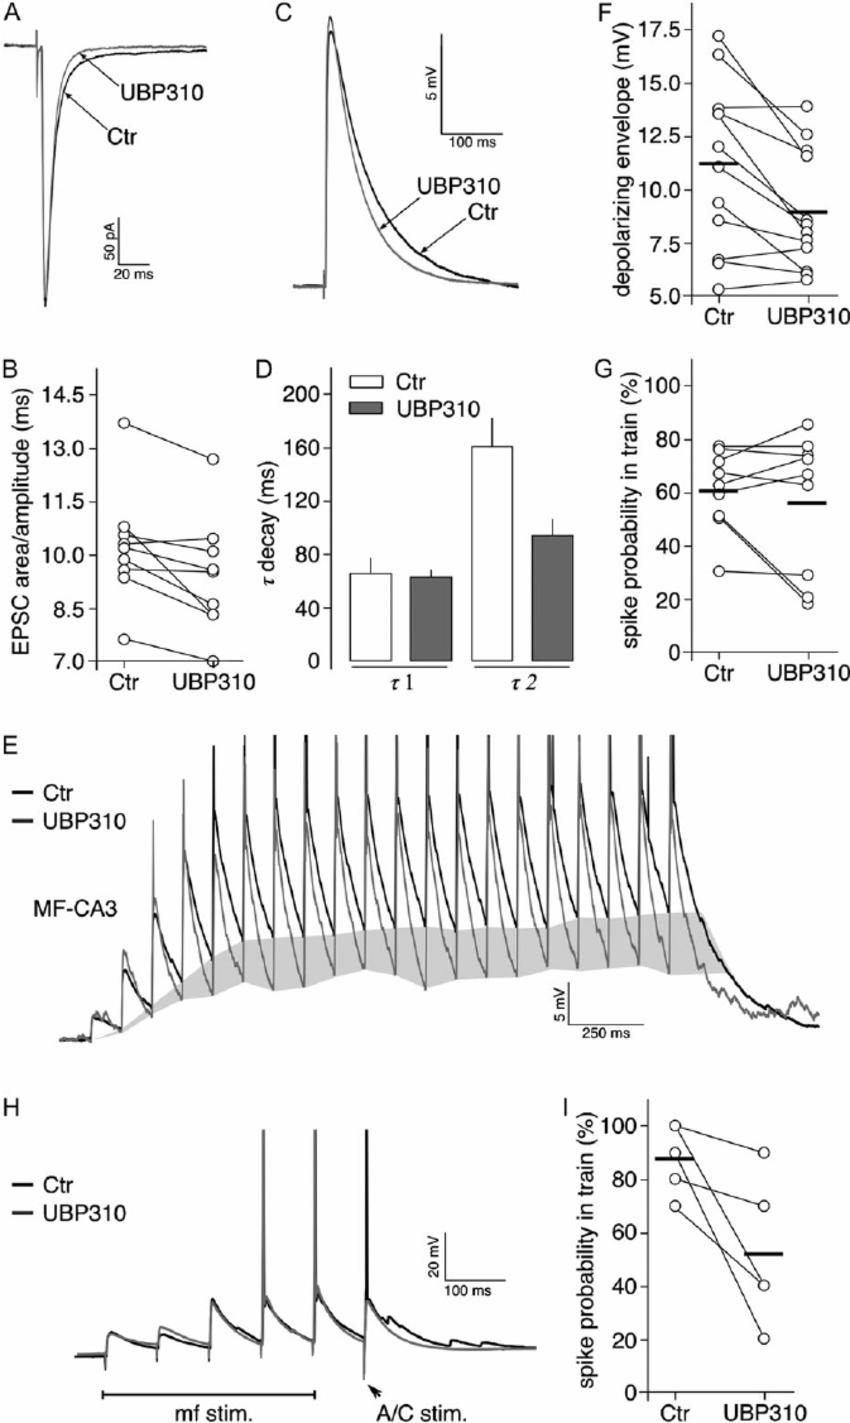 Participation of postsynaptic KARs to mf-CA3 synaptic